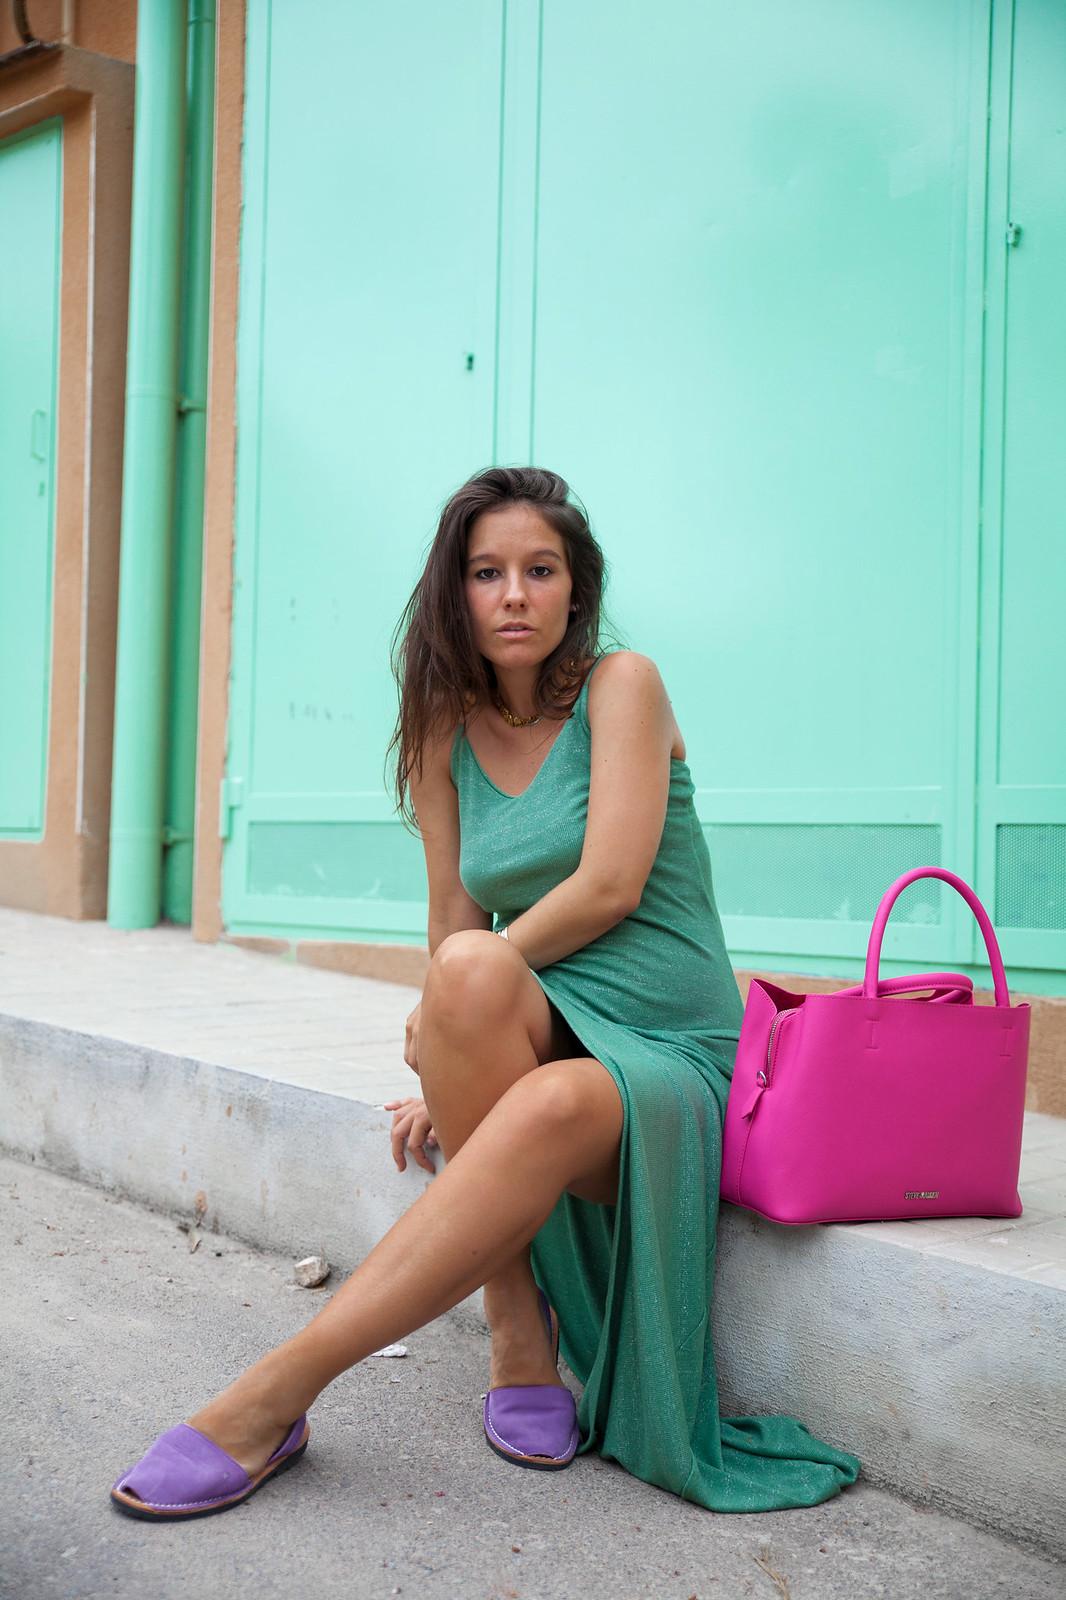 02_Vestido_turquesa_largo_outfit_embarazada_influencer_barcelona_theguestgirl_bolso_rosa